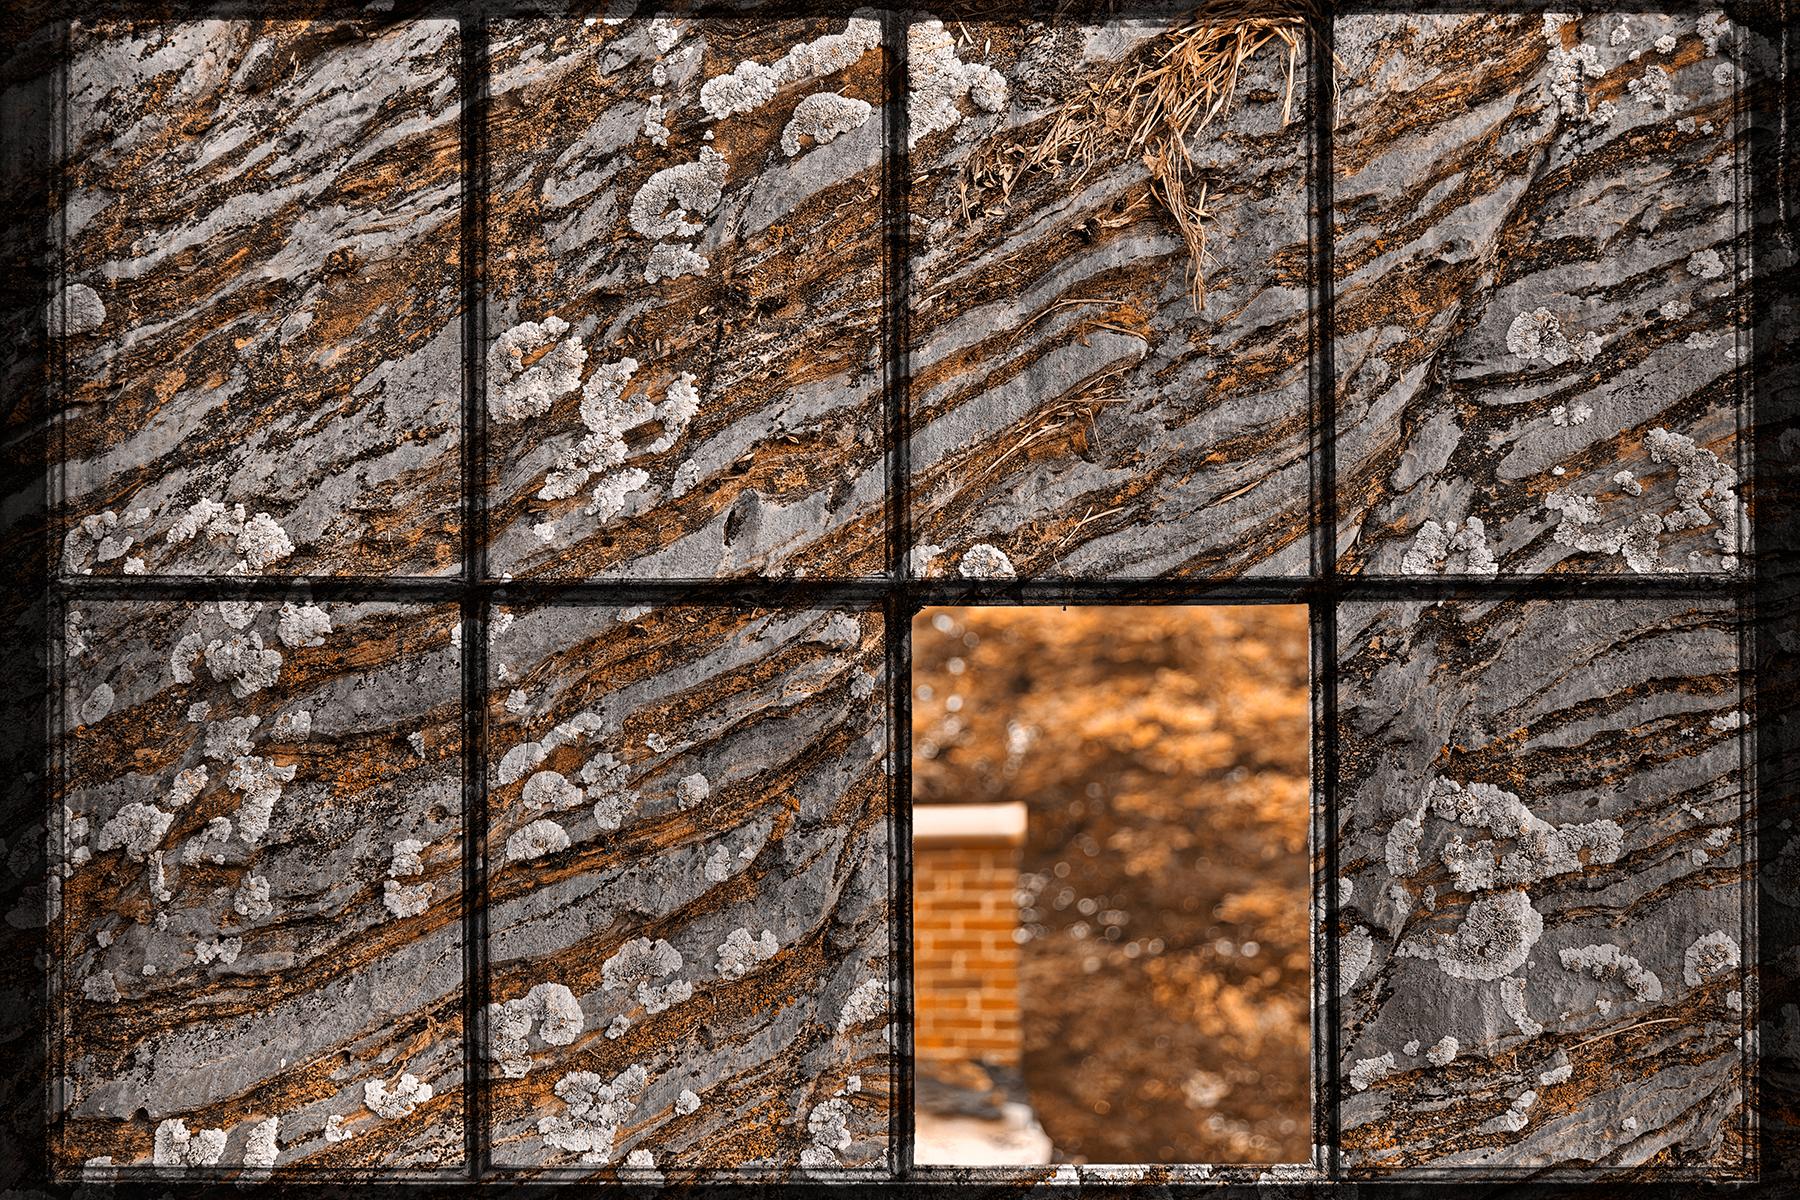 Petrified Window, Abandoned, Outdoor, Ridged, Ridge, HQ Photo